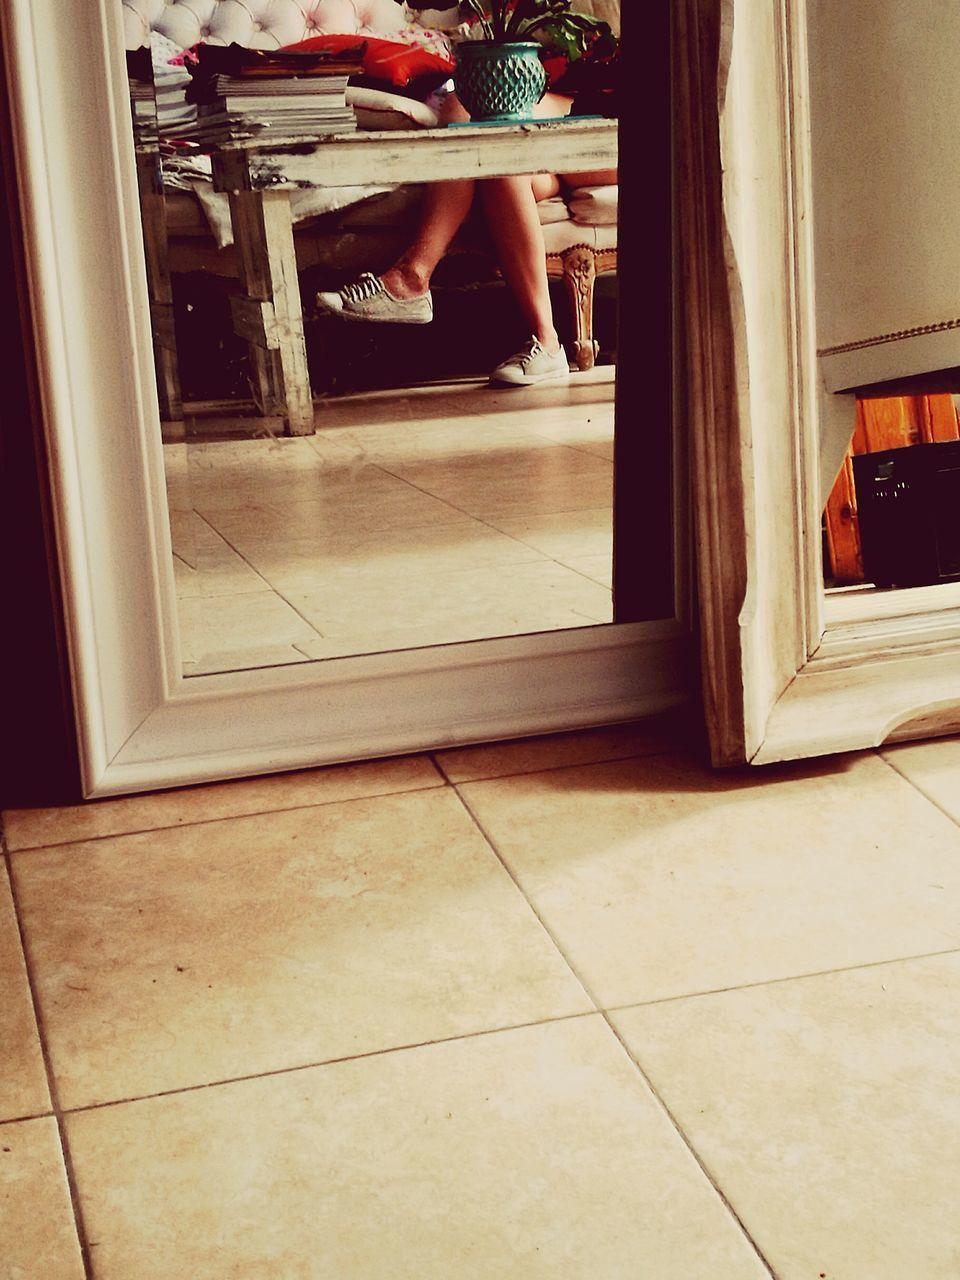 low section, one person, human leg, indoors, barefoot, door, real people, home interior, tiled floor, window, domestic life, sitting, doorway, human body part, domestic room, kitchen, day, lifestyles, open door, childhood, people